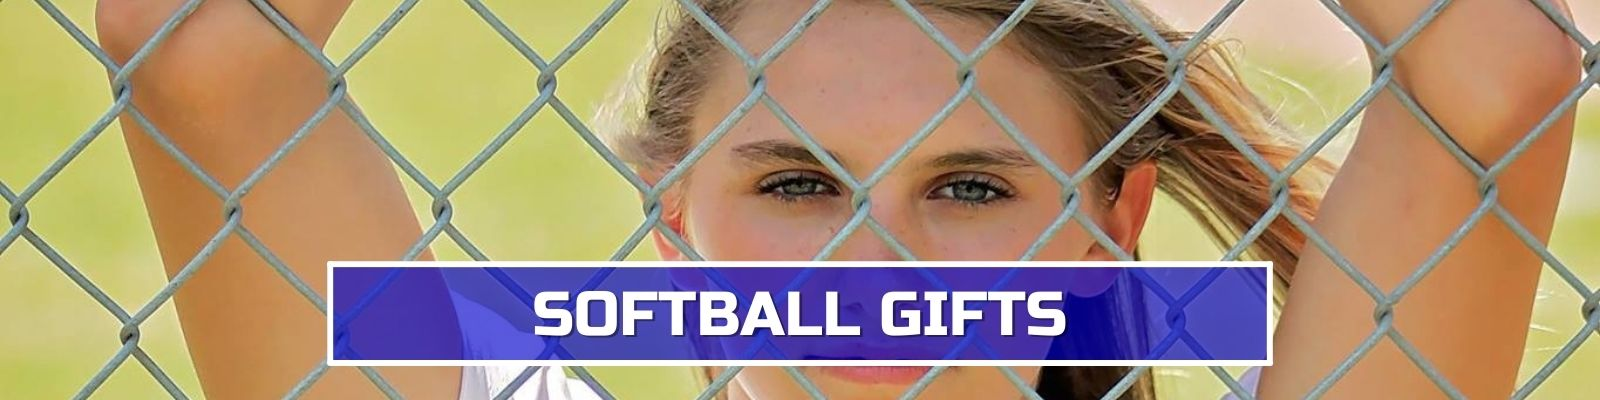 softball-gifts